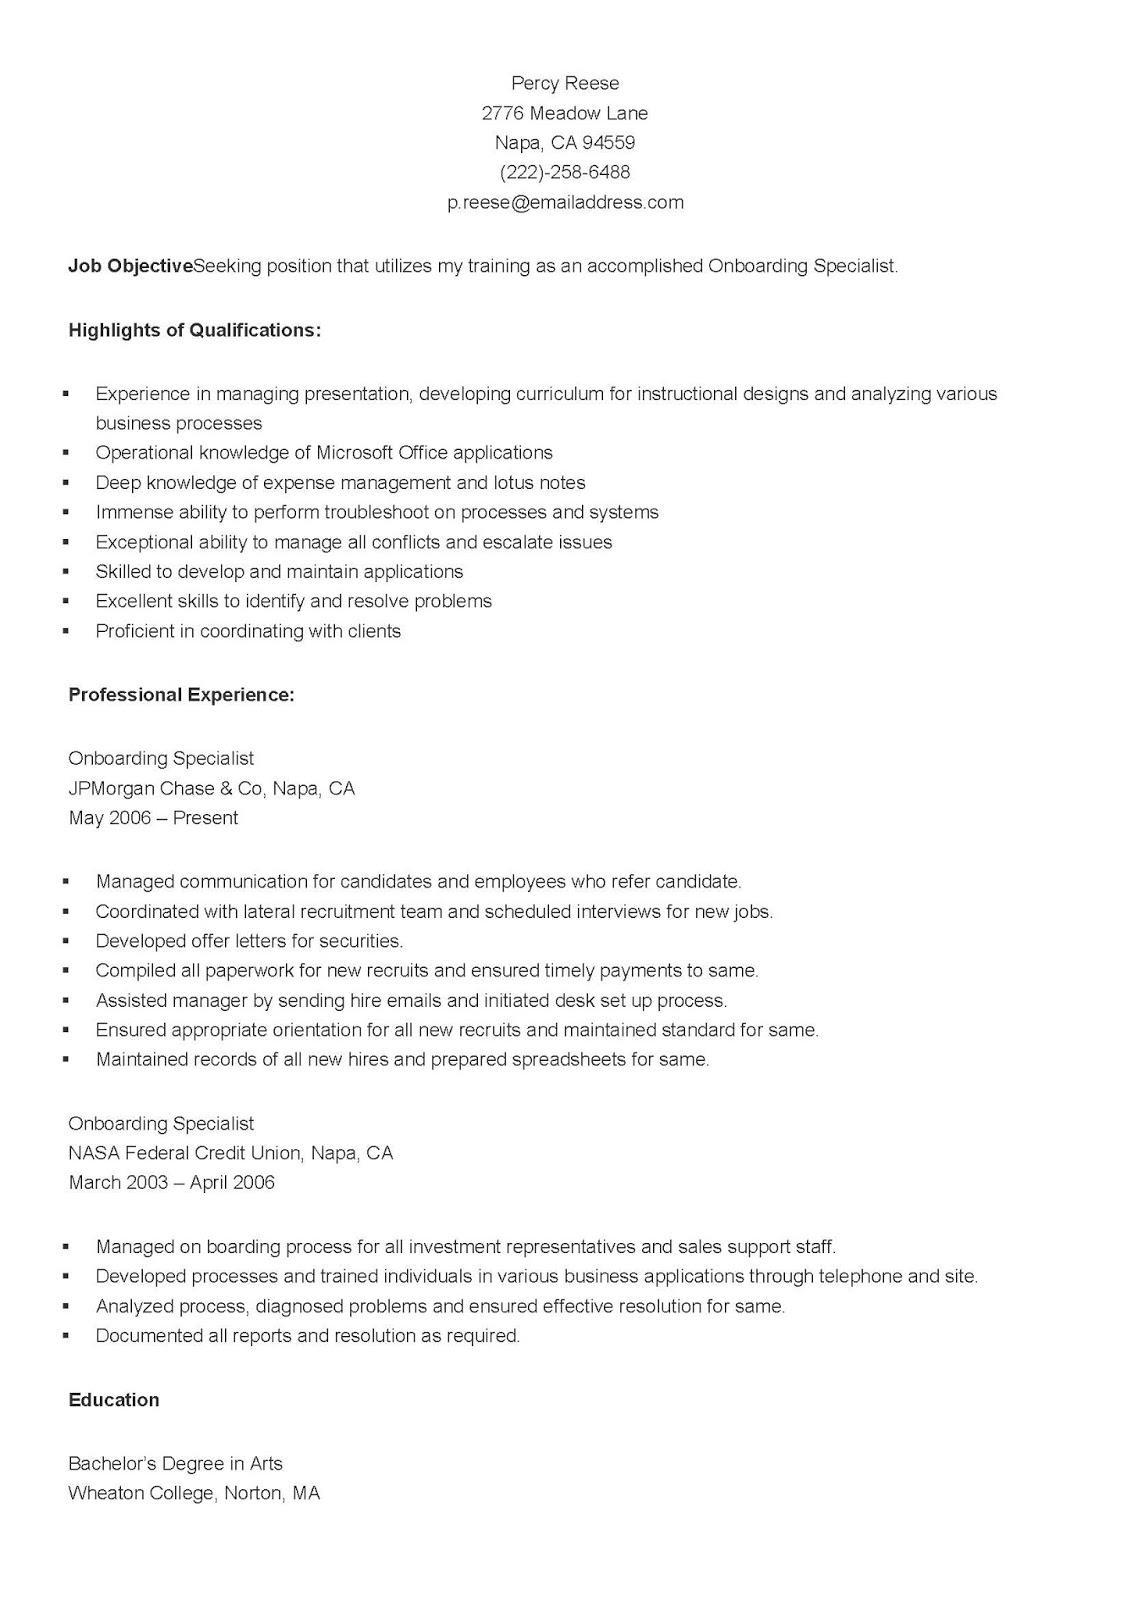 onboarding specialist job sample resume